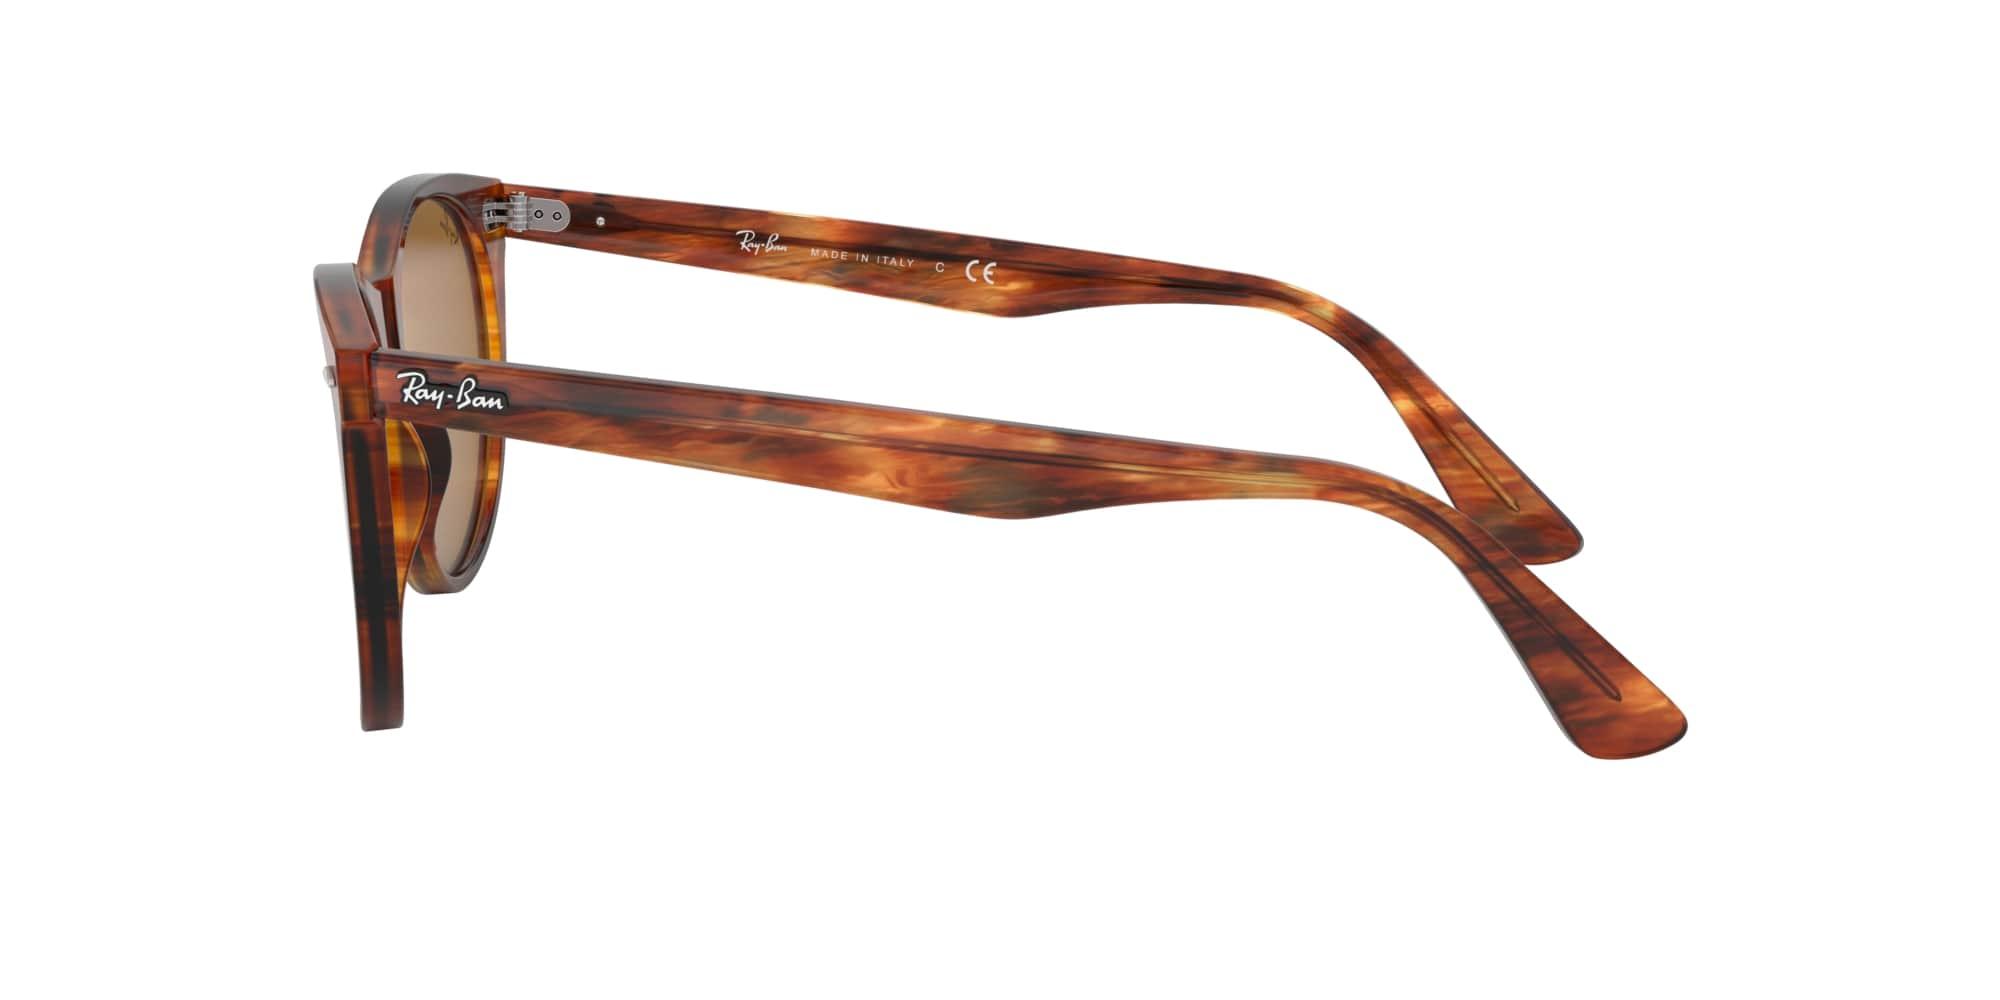 Ray Ban Wayfarer II Classic solbriller, striped havana/brown classic